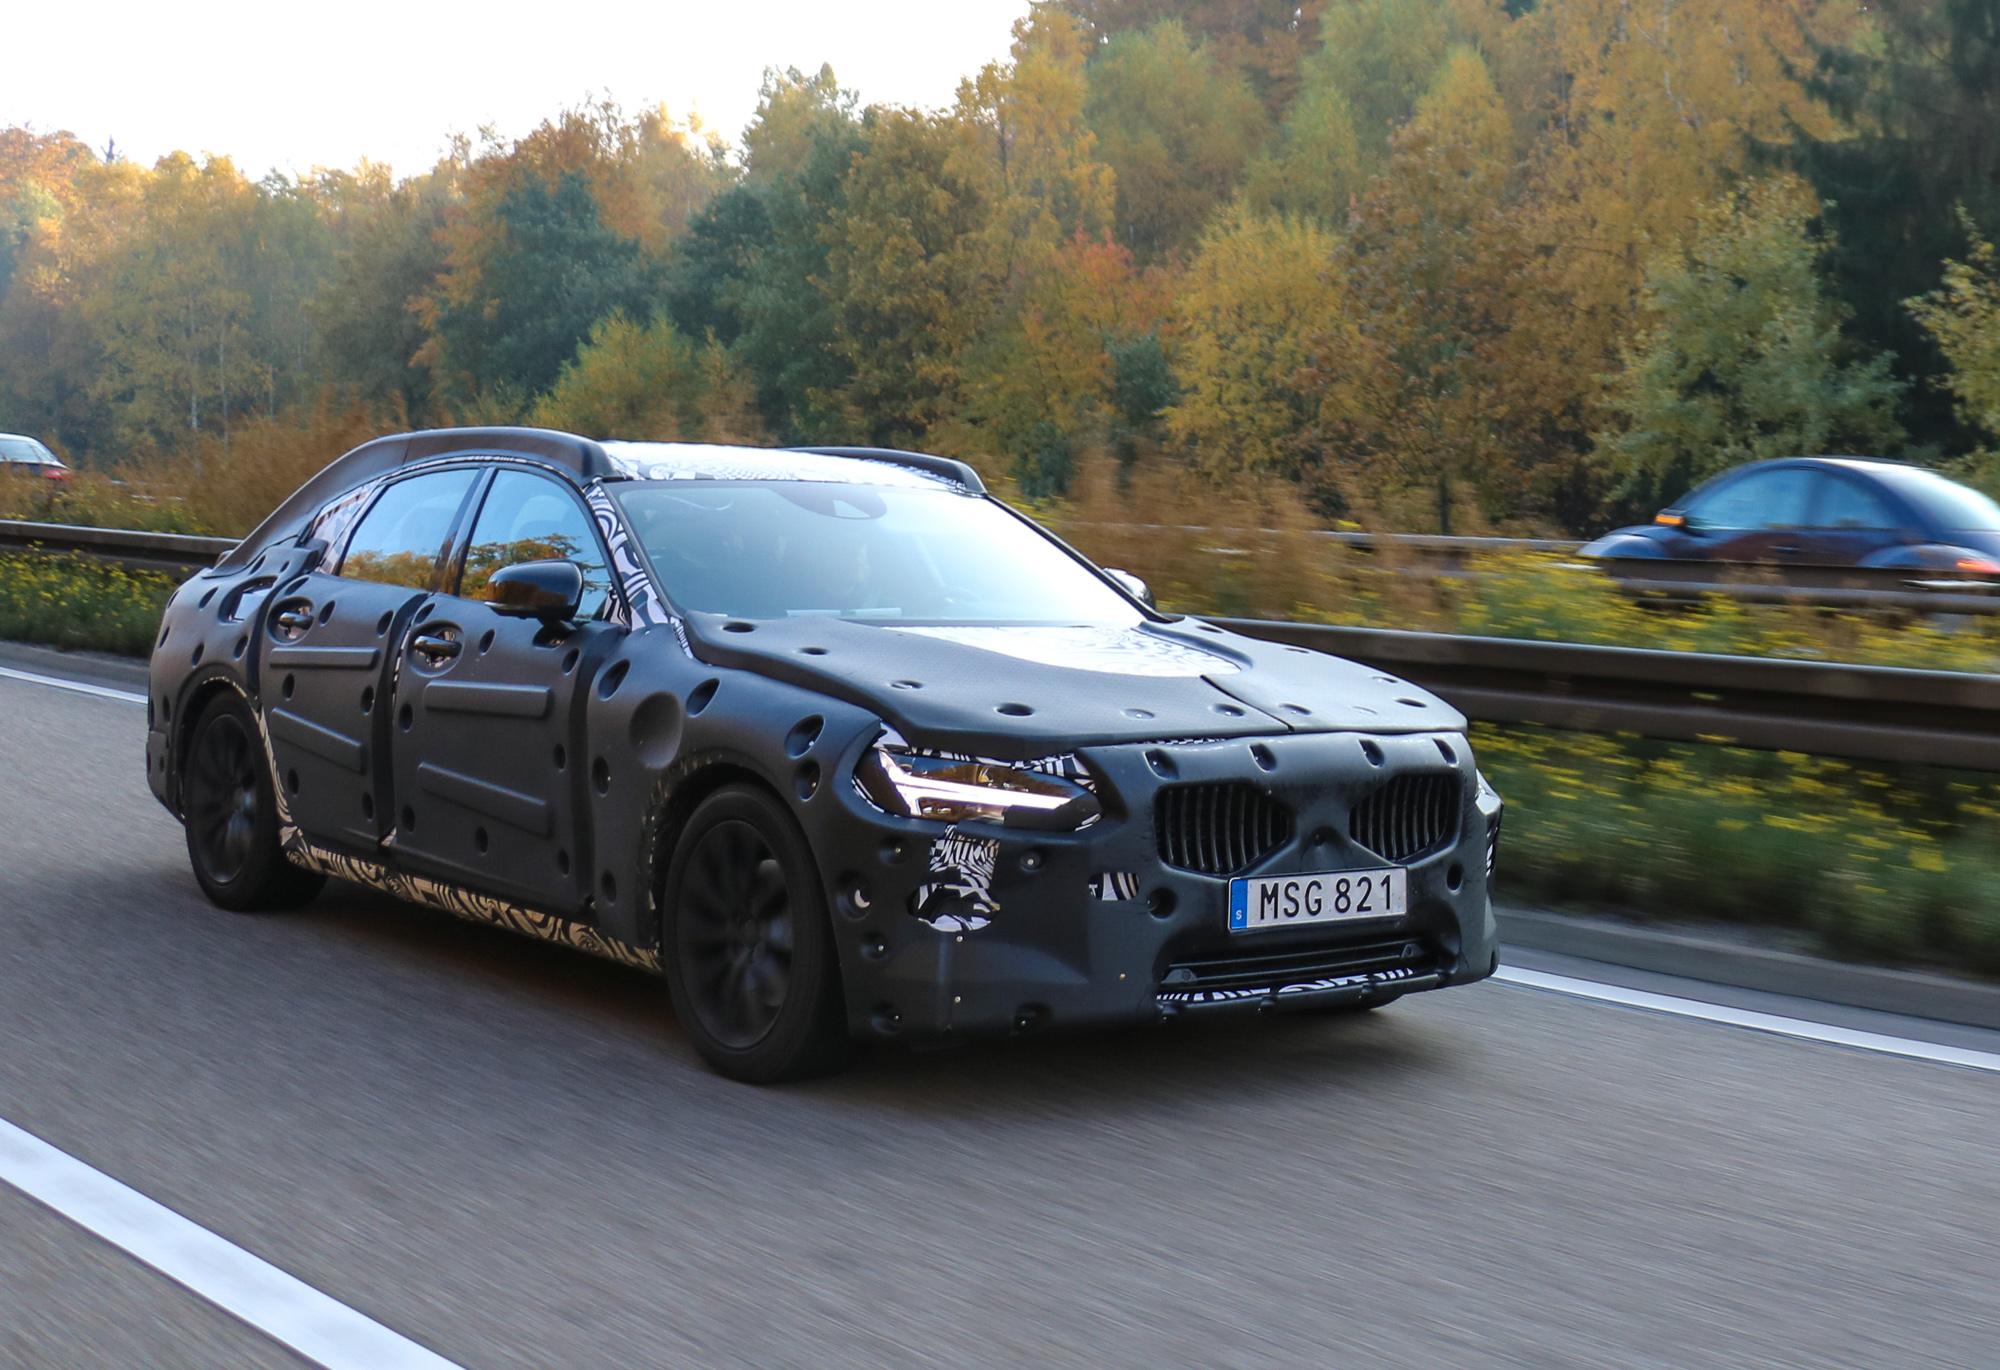 Fotos: Volvo S90 2016 Erlkönig